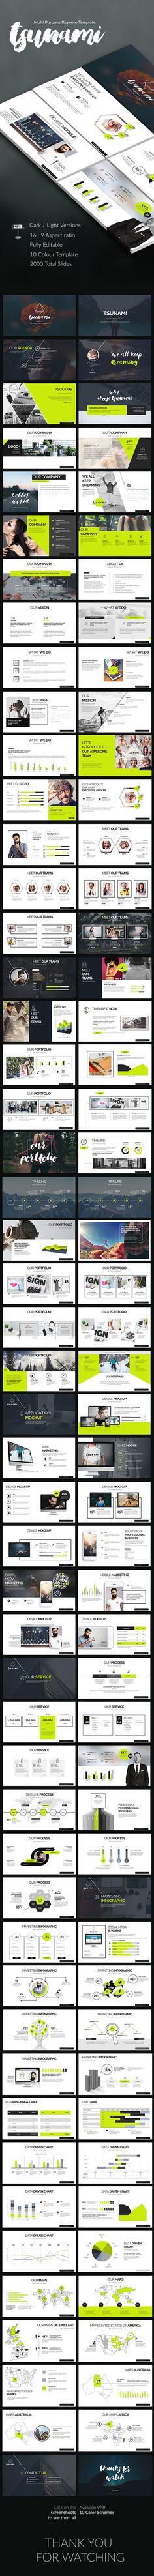 Tsunami Keynote Presentation — Keynote KEY #fancy #design • Download ➝ https://graphicriver.net/item/tsunami-keynote-presentation/19160502?ref=pxcr